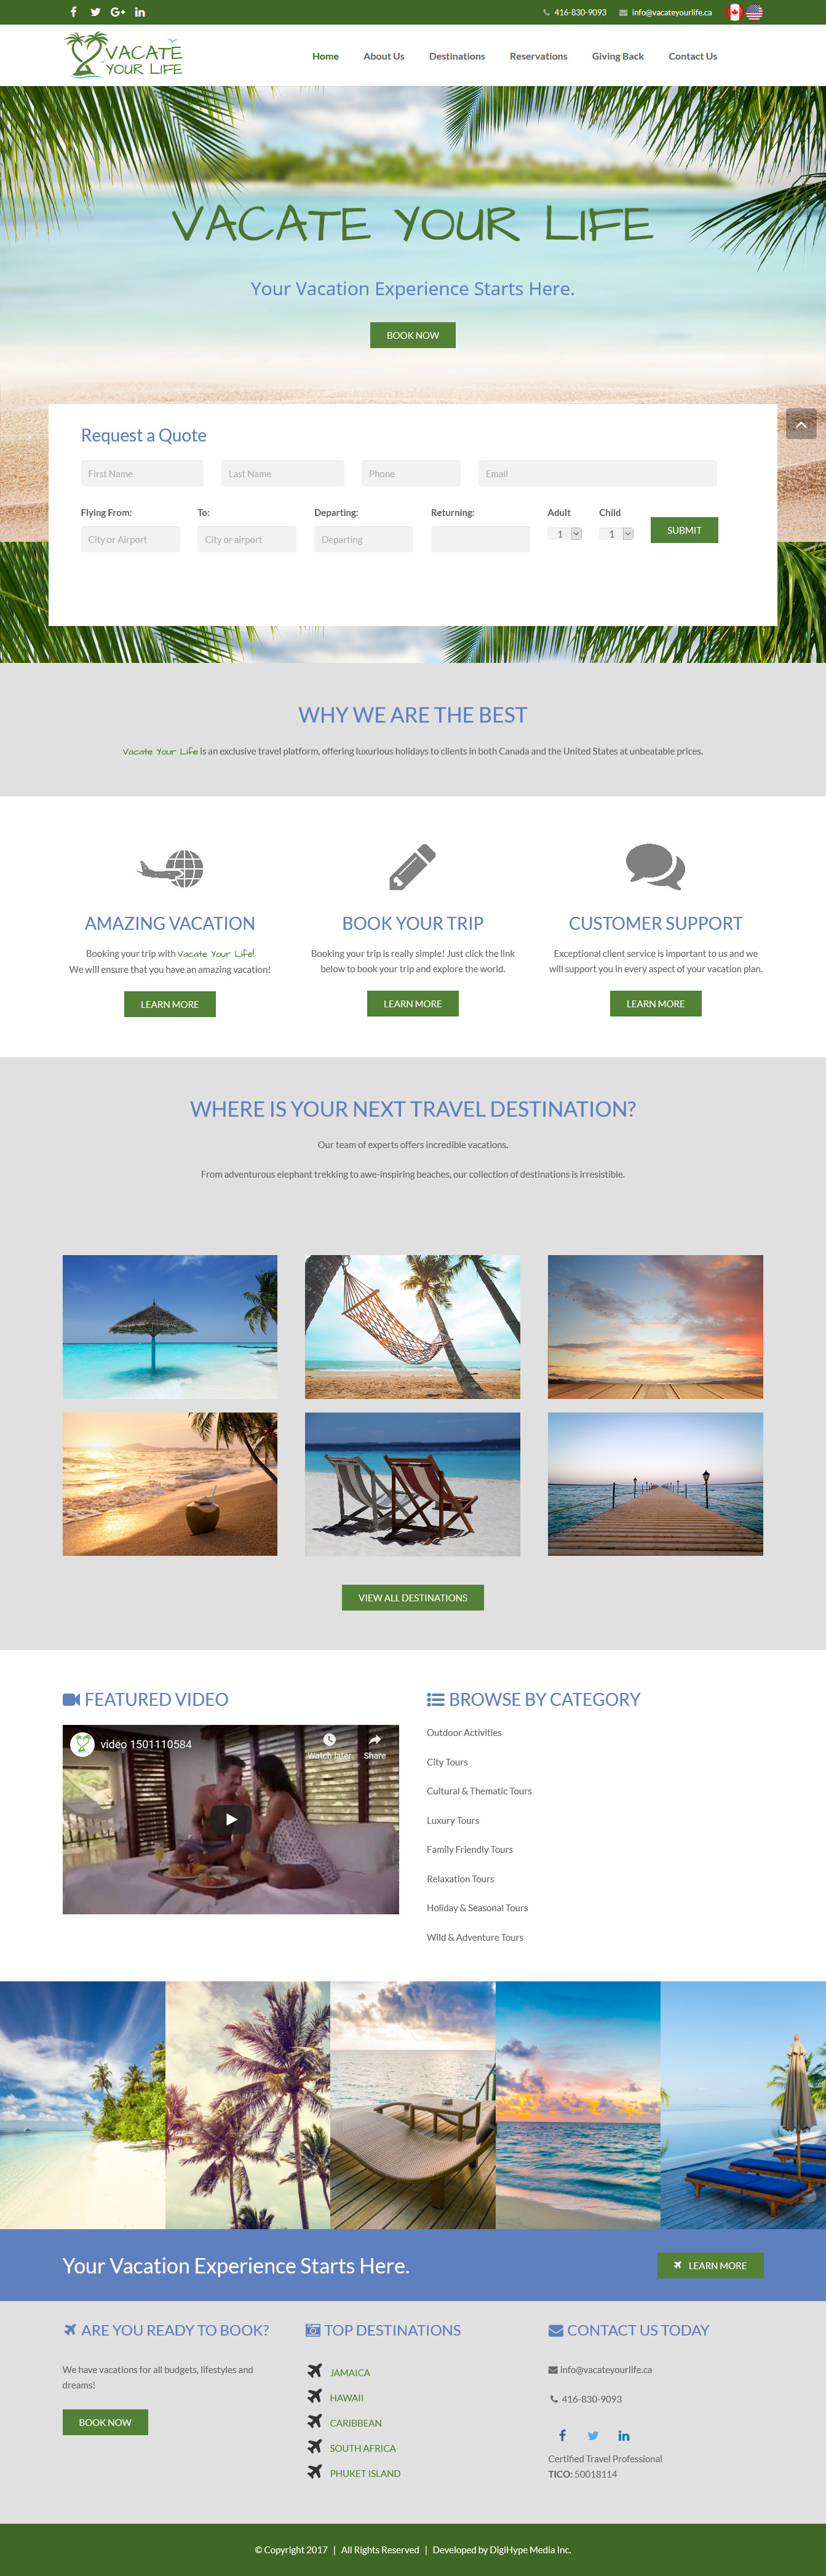 Local Toronto Travel Agency (website UX design)